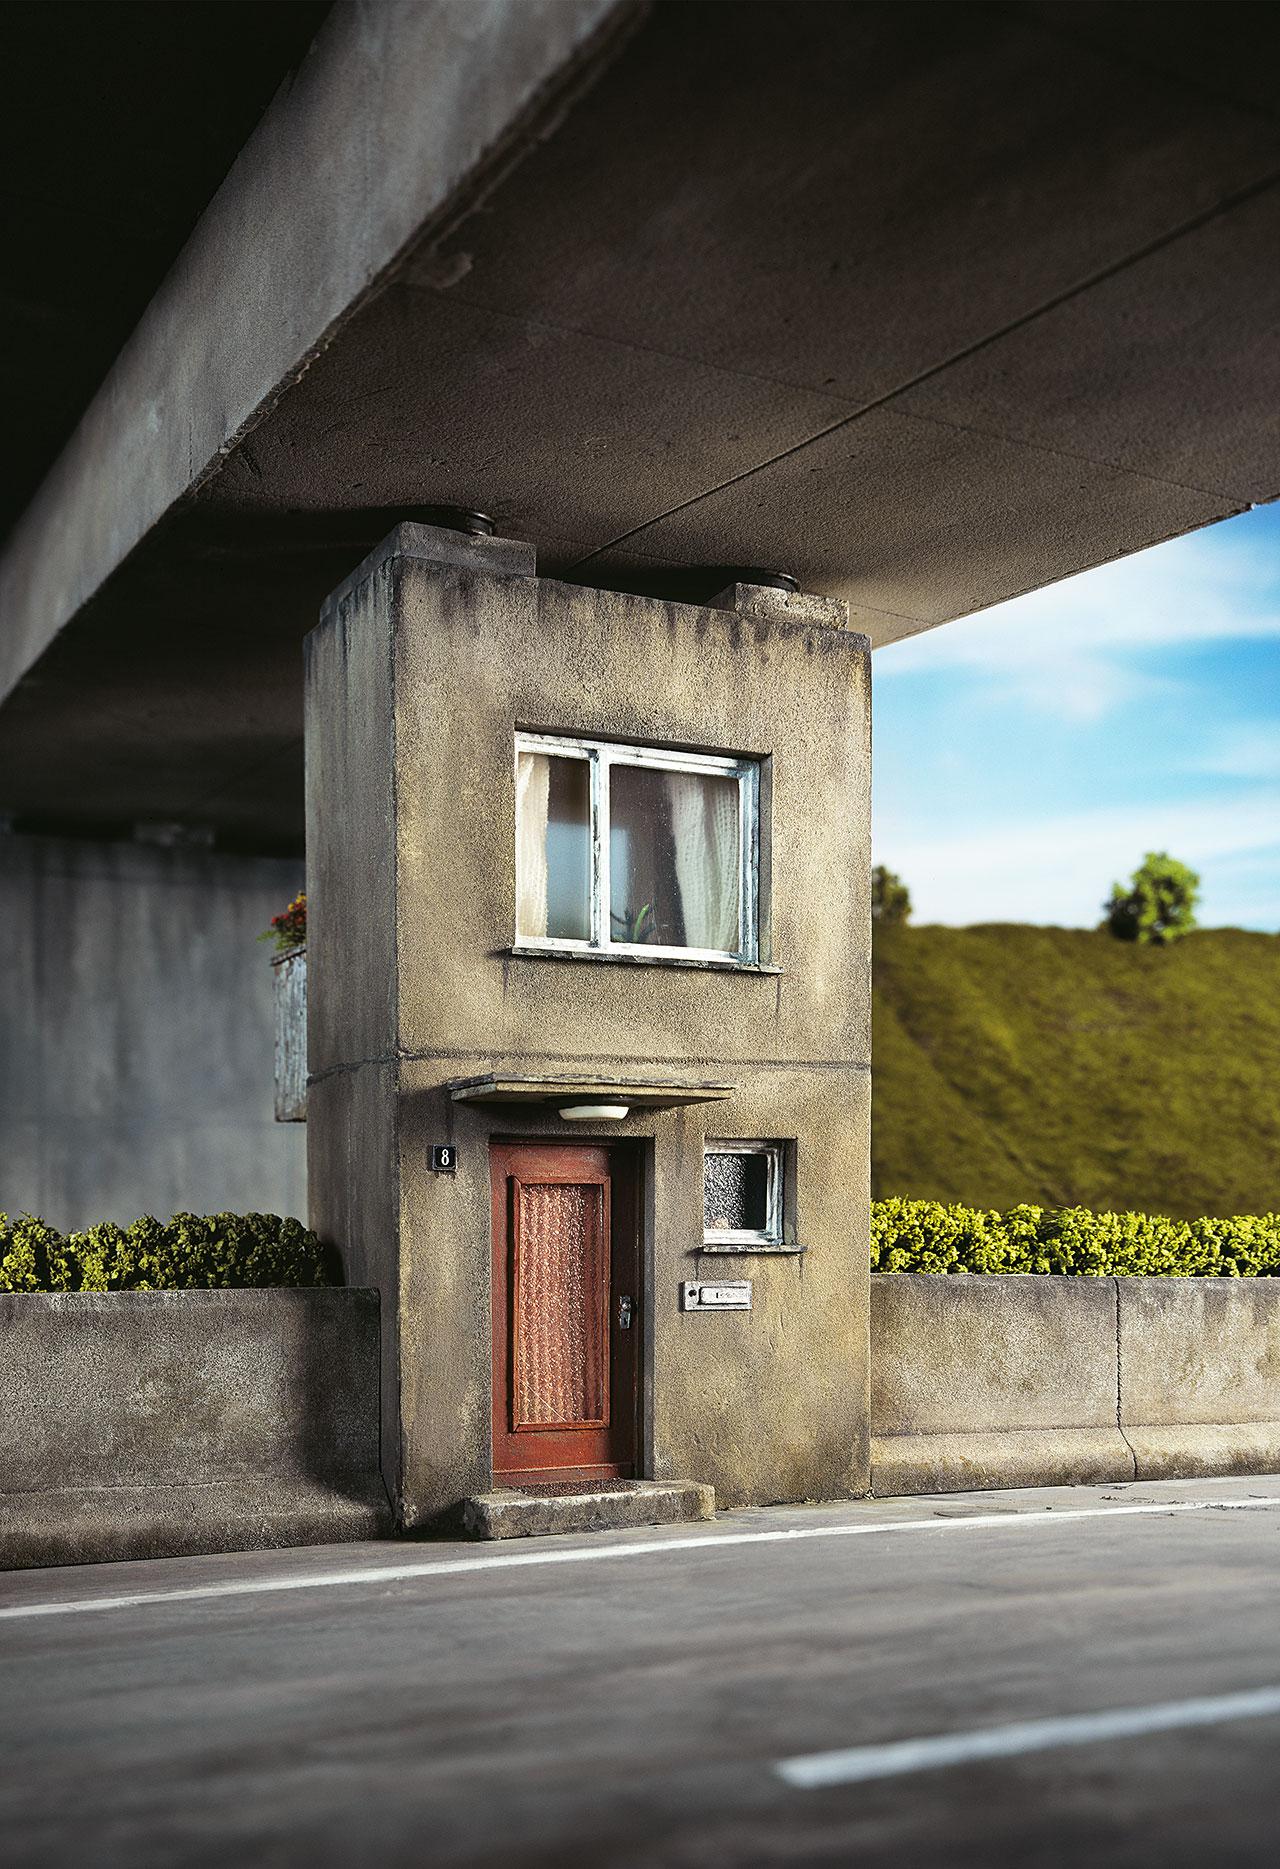 Frank Kunert - Lifestyle - Felix Schoeller Photoaward